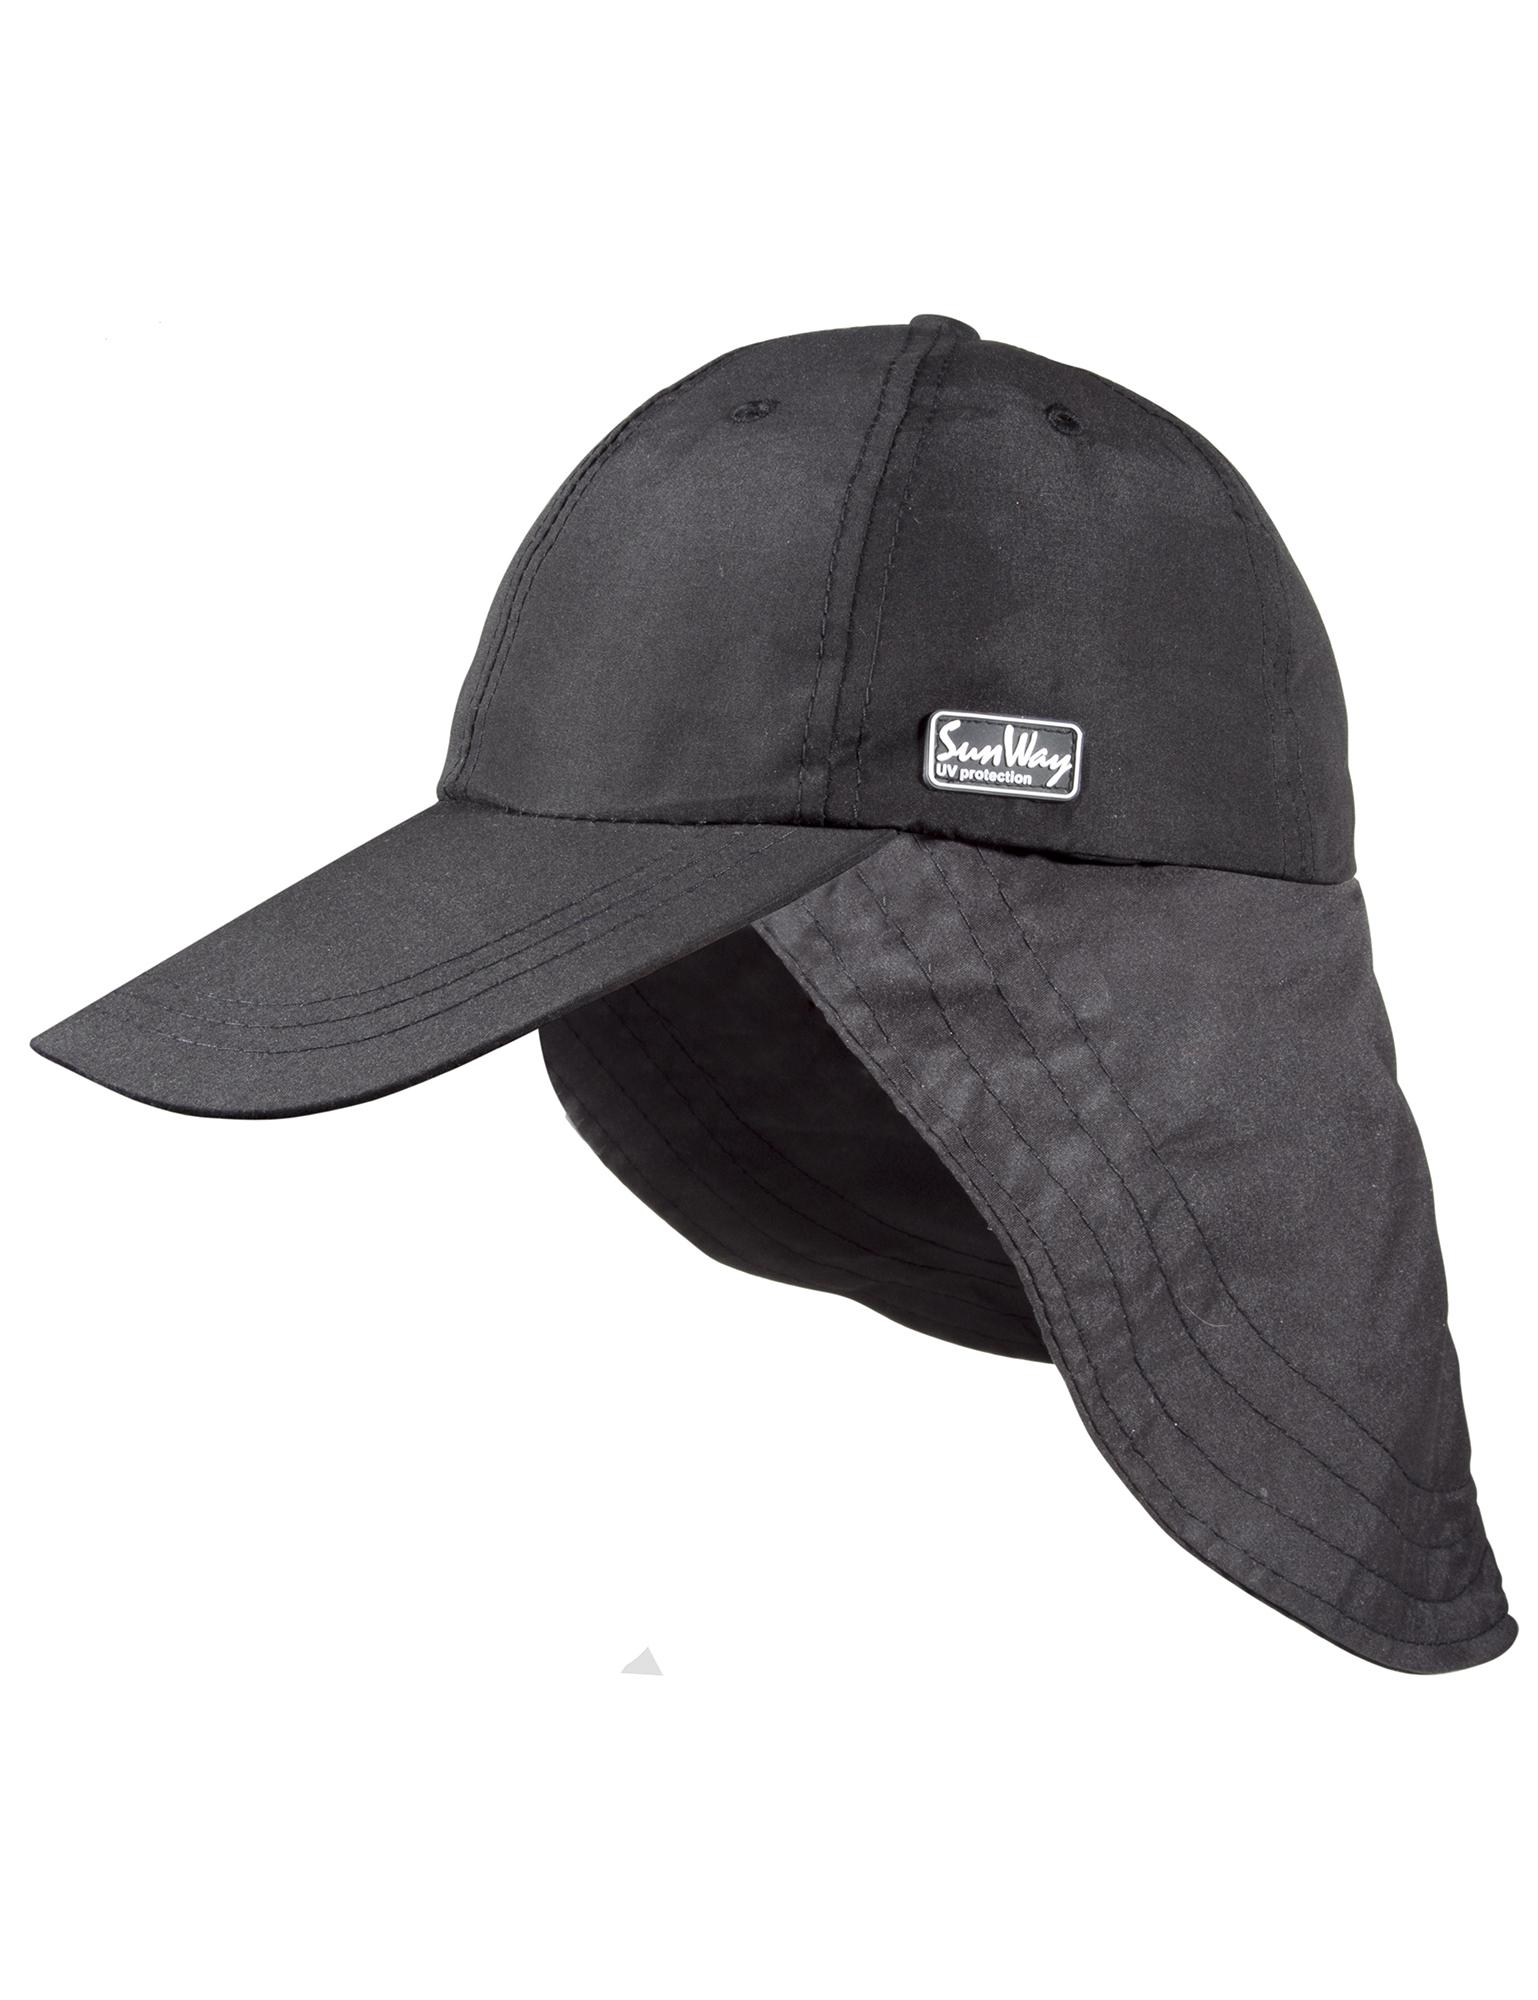 UV Protective Hats: SunWay's UV Baseball Legionnaire Cap